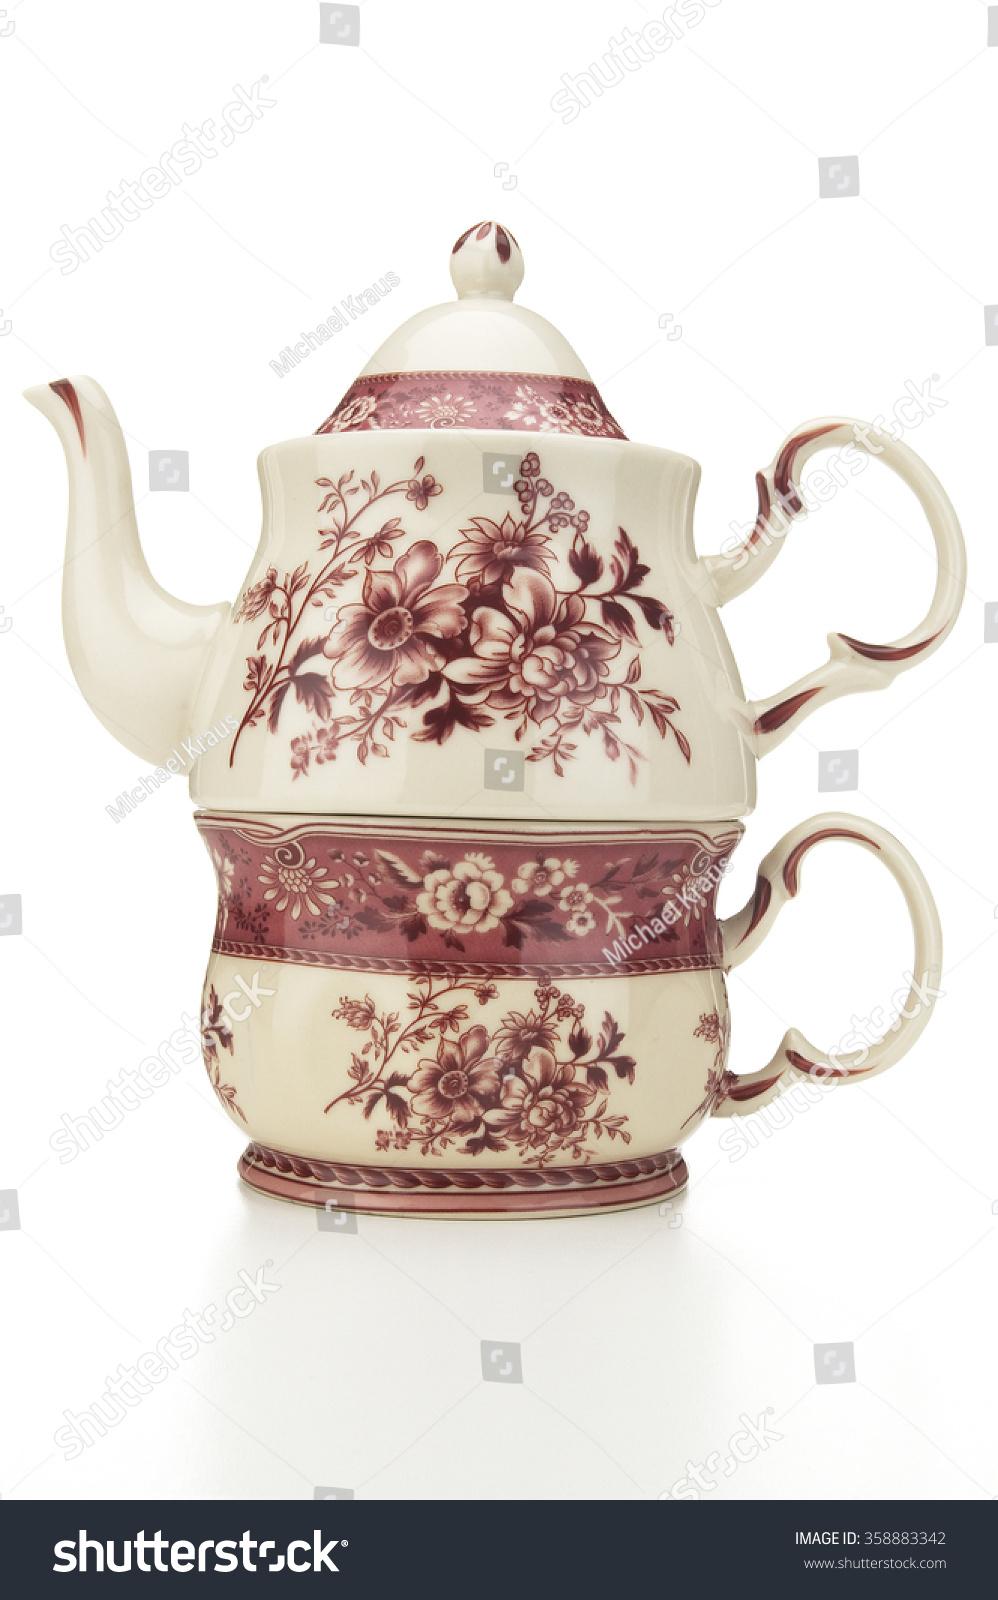 Fancy Tea Pot Stock Photo Edit Now 358883342